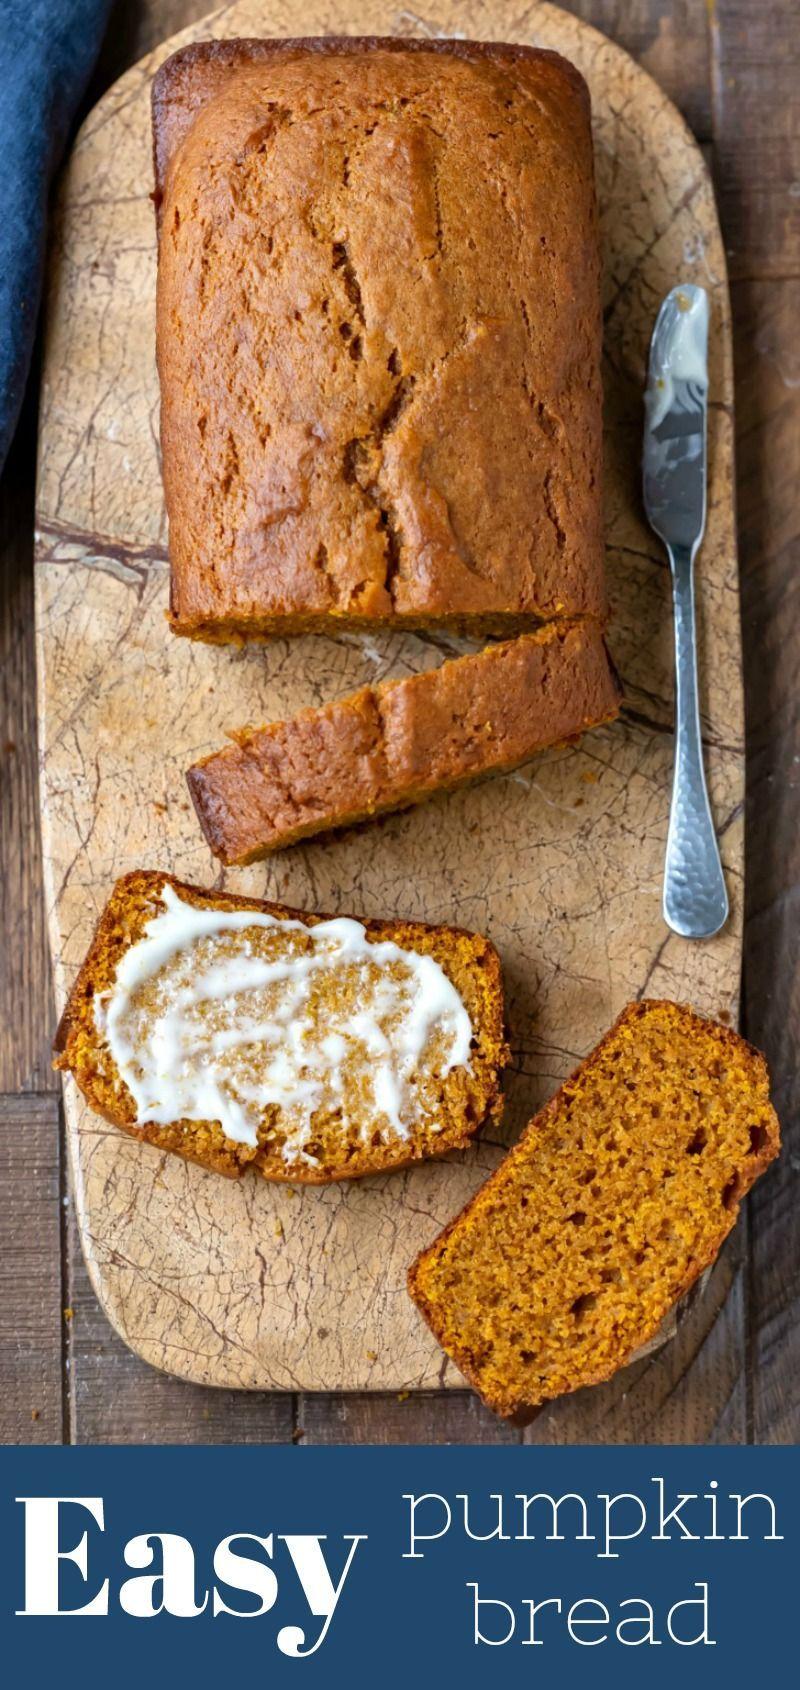 Easy Pumpkin Bread| images